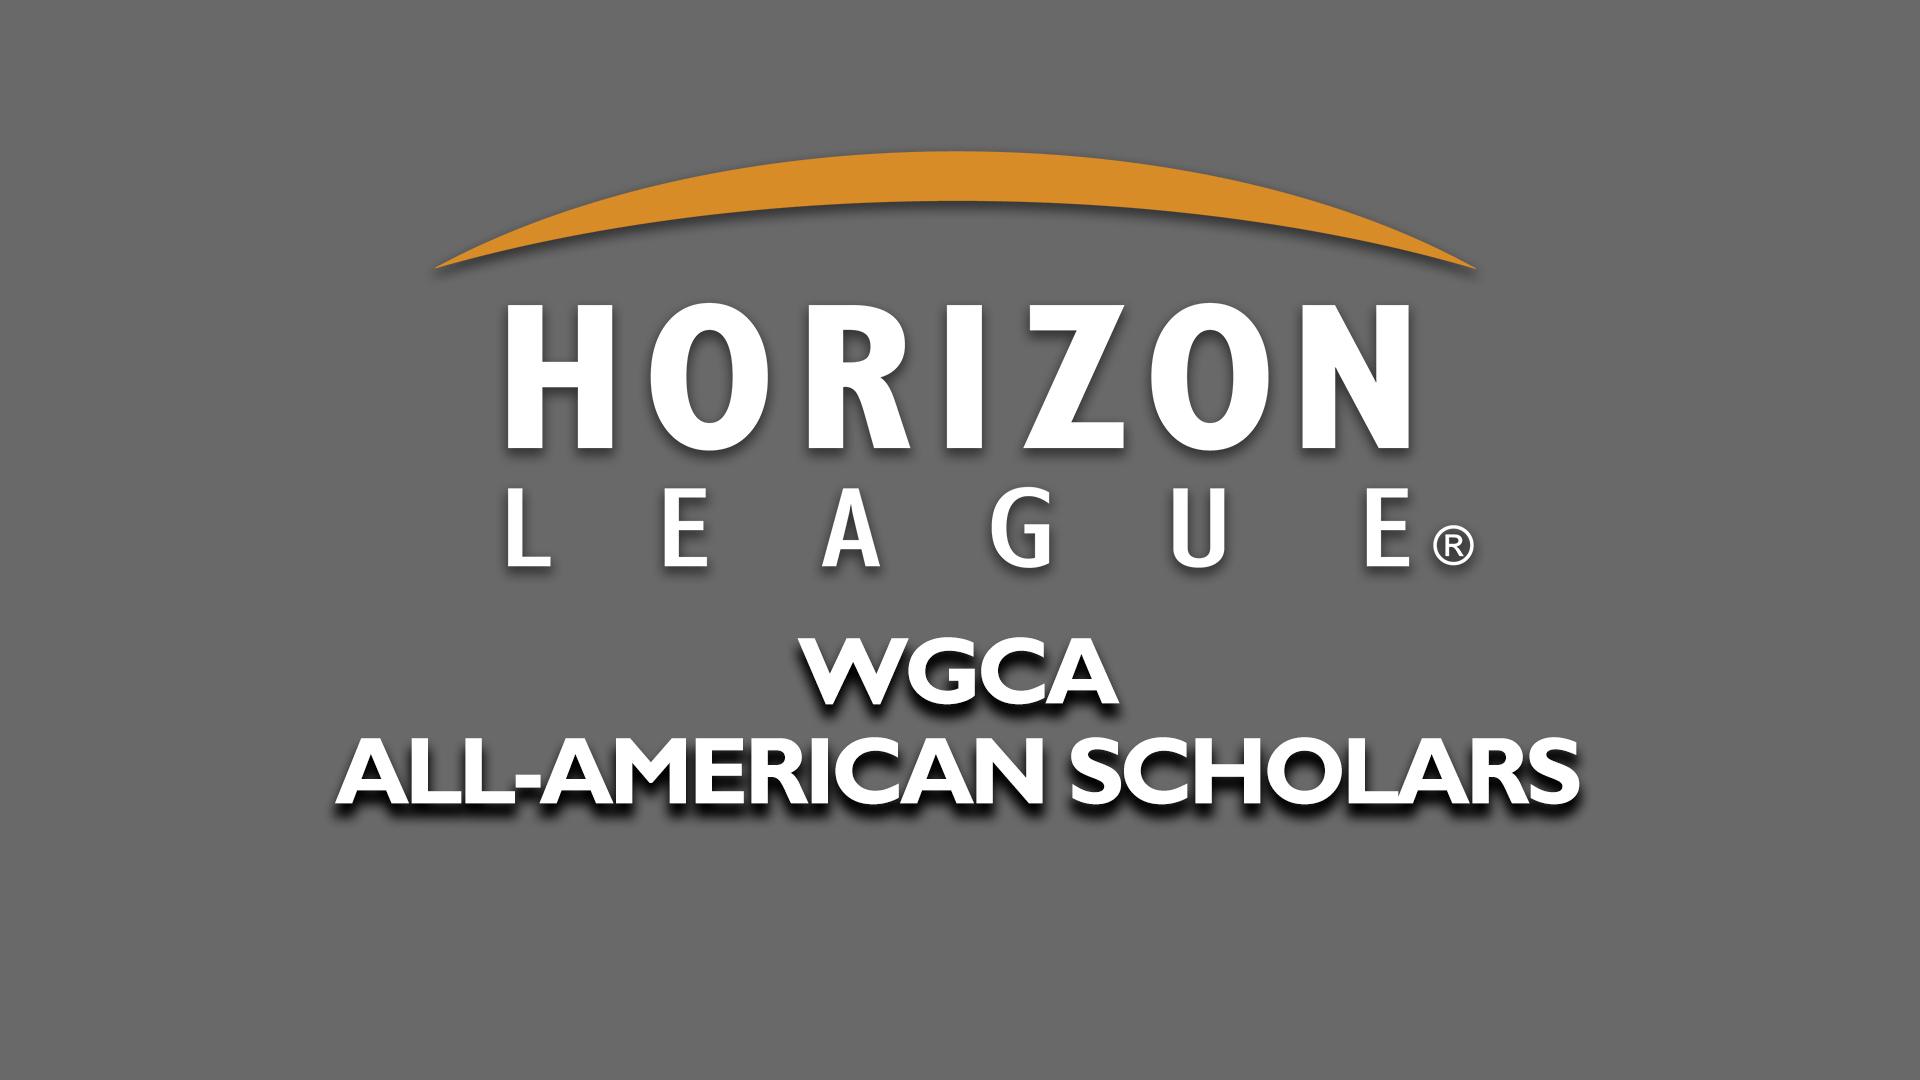 784 Student-Athletes Compose 2013 Fall Horizon League